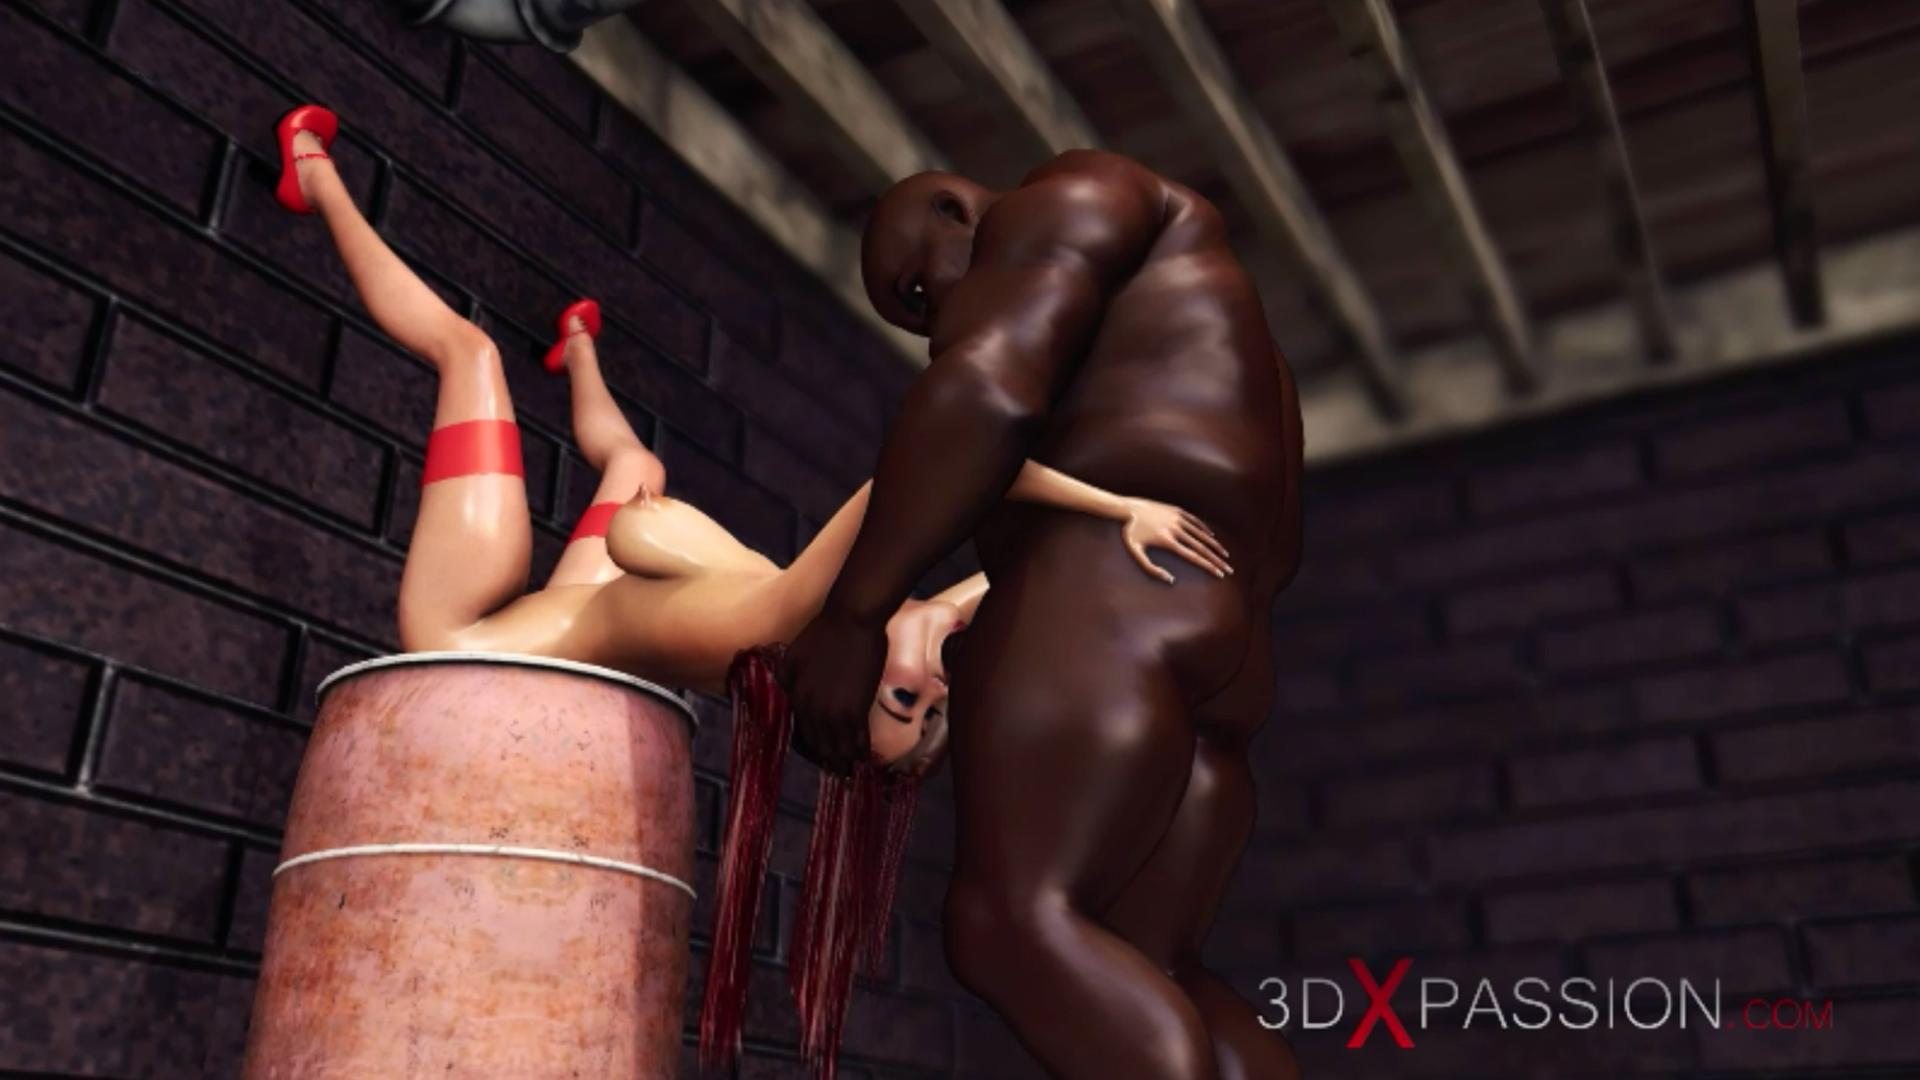 Horny red-haired girl fucked hard extreme irrumatio black man basement